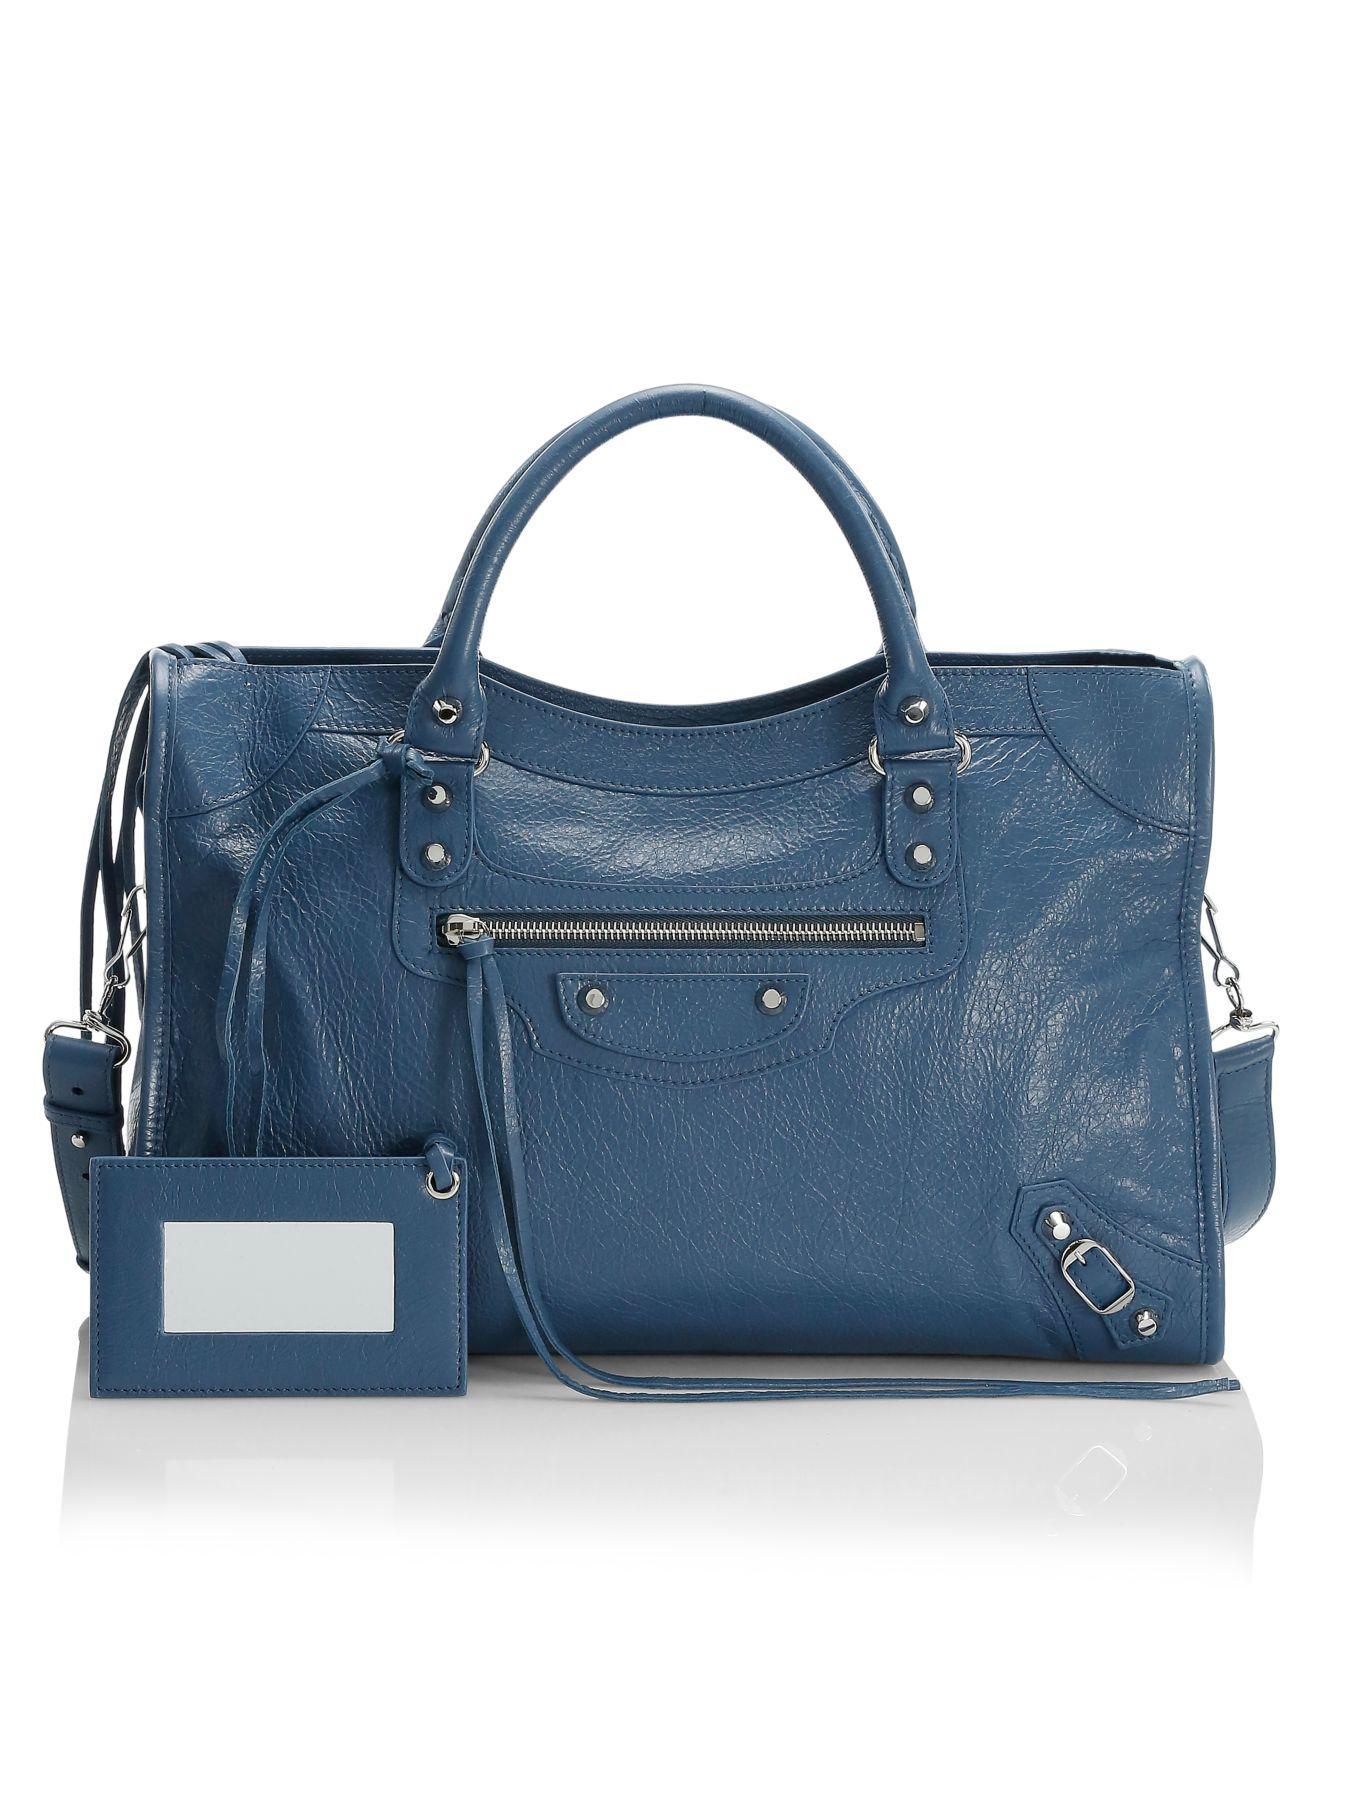 Balenciaga Medium Classic City Leather